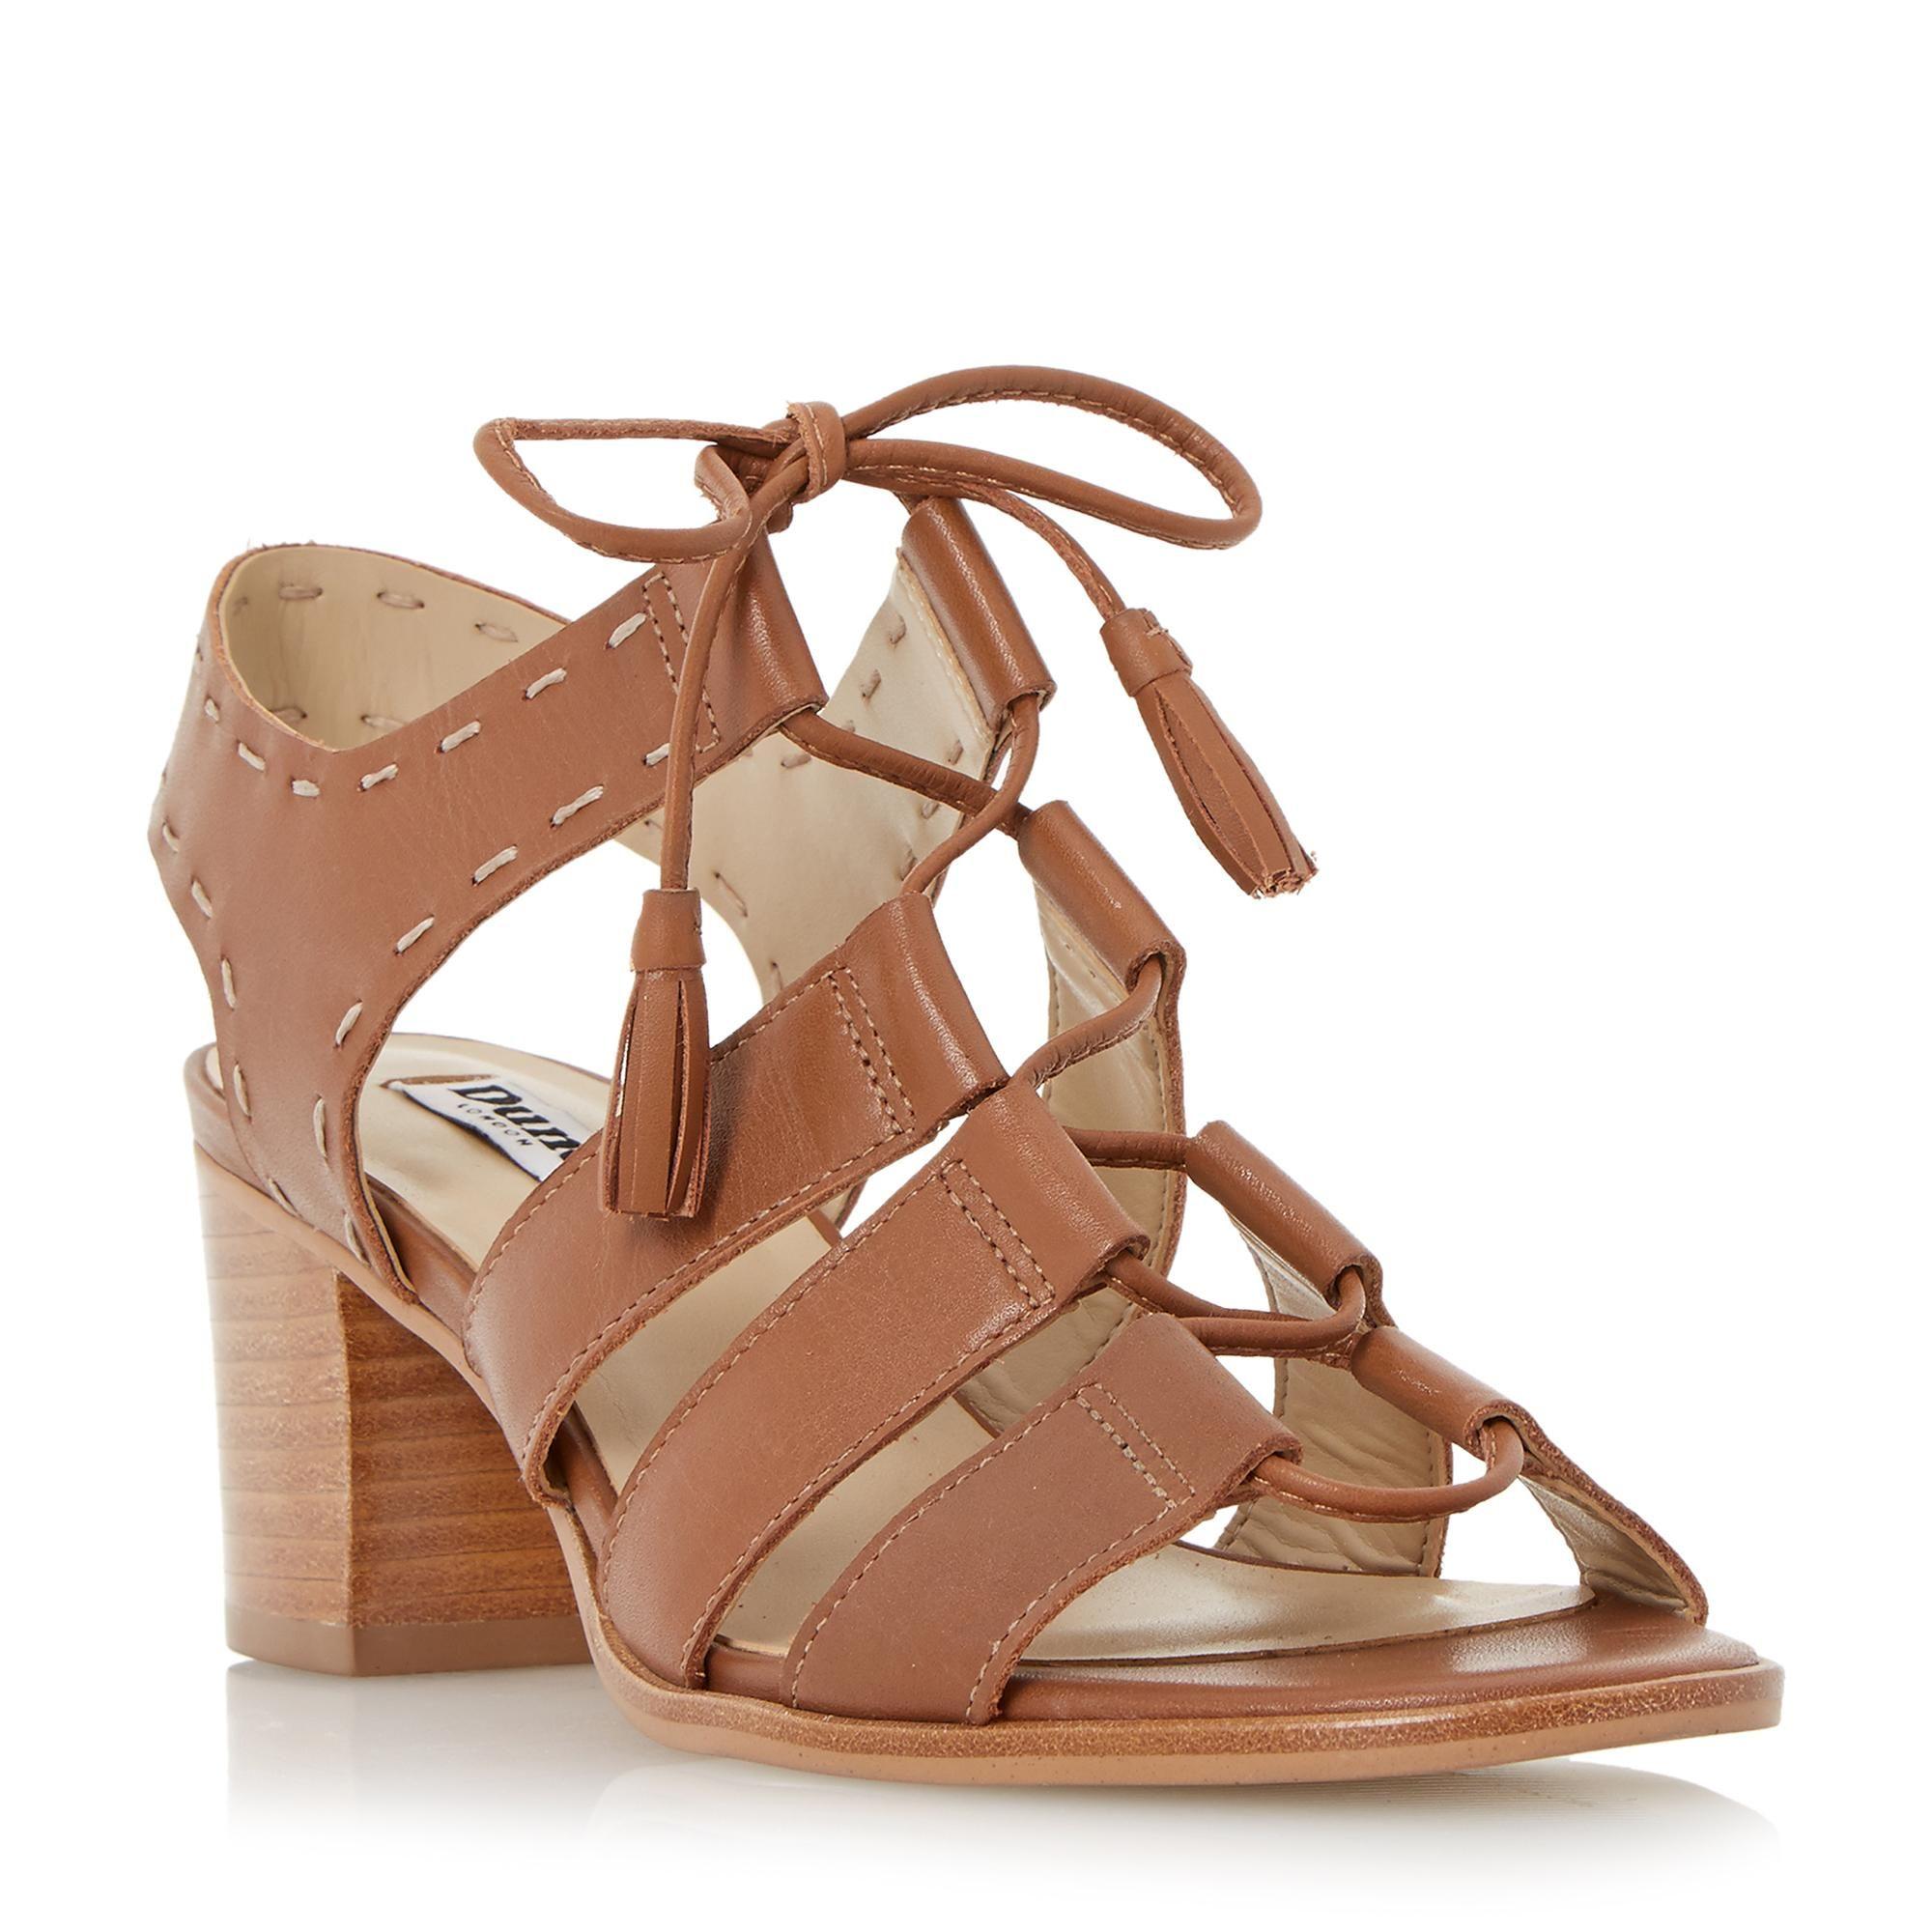 2f01364cdfb DUNE LADIES IVANNA - Ghillie Lace Block Heel Sandal - tan